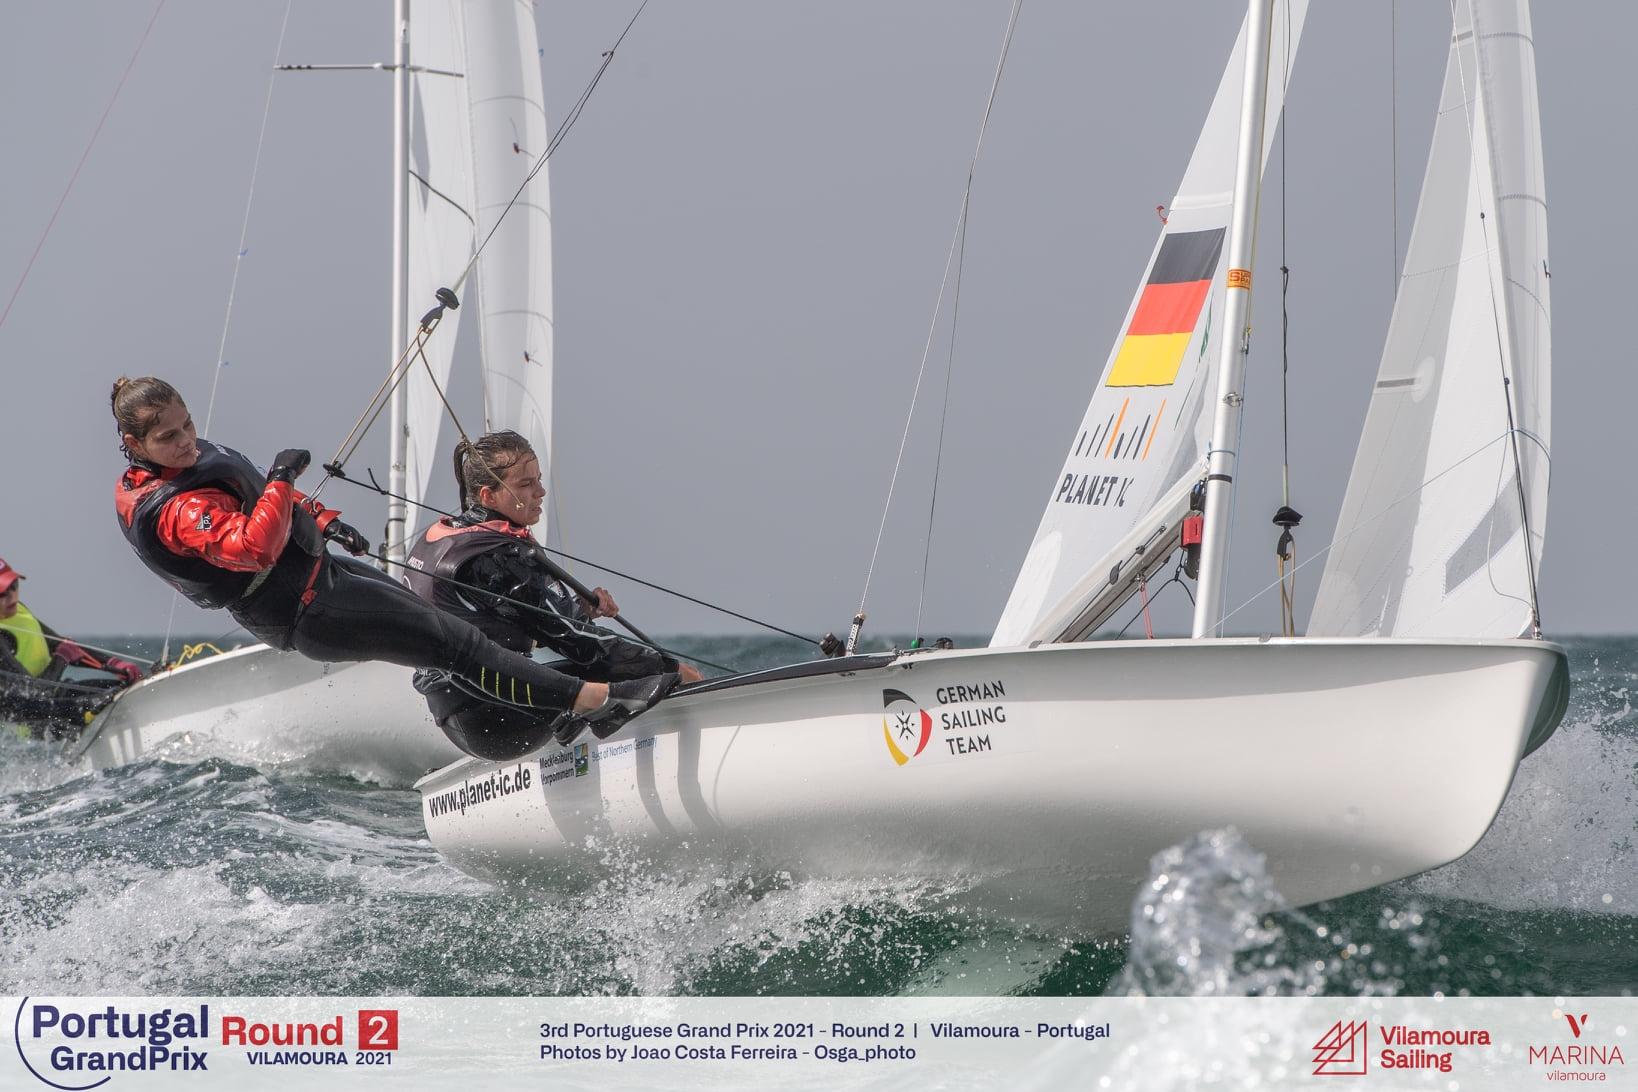 470, RS:X-Windsurfer - Portugal Grand Prix - Round 2 - Vilamoura POR - Final results